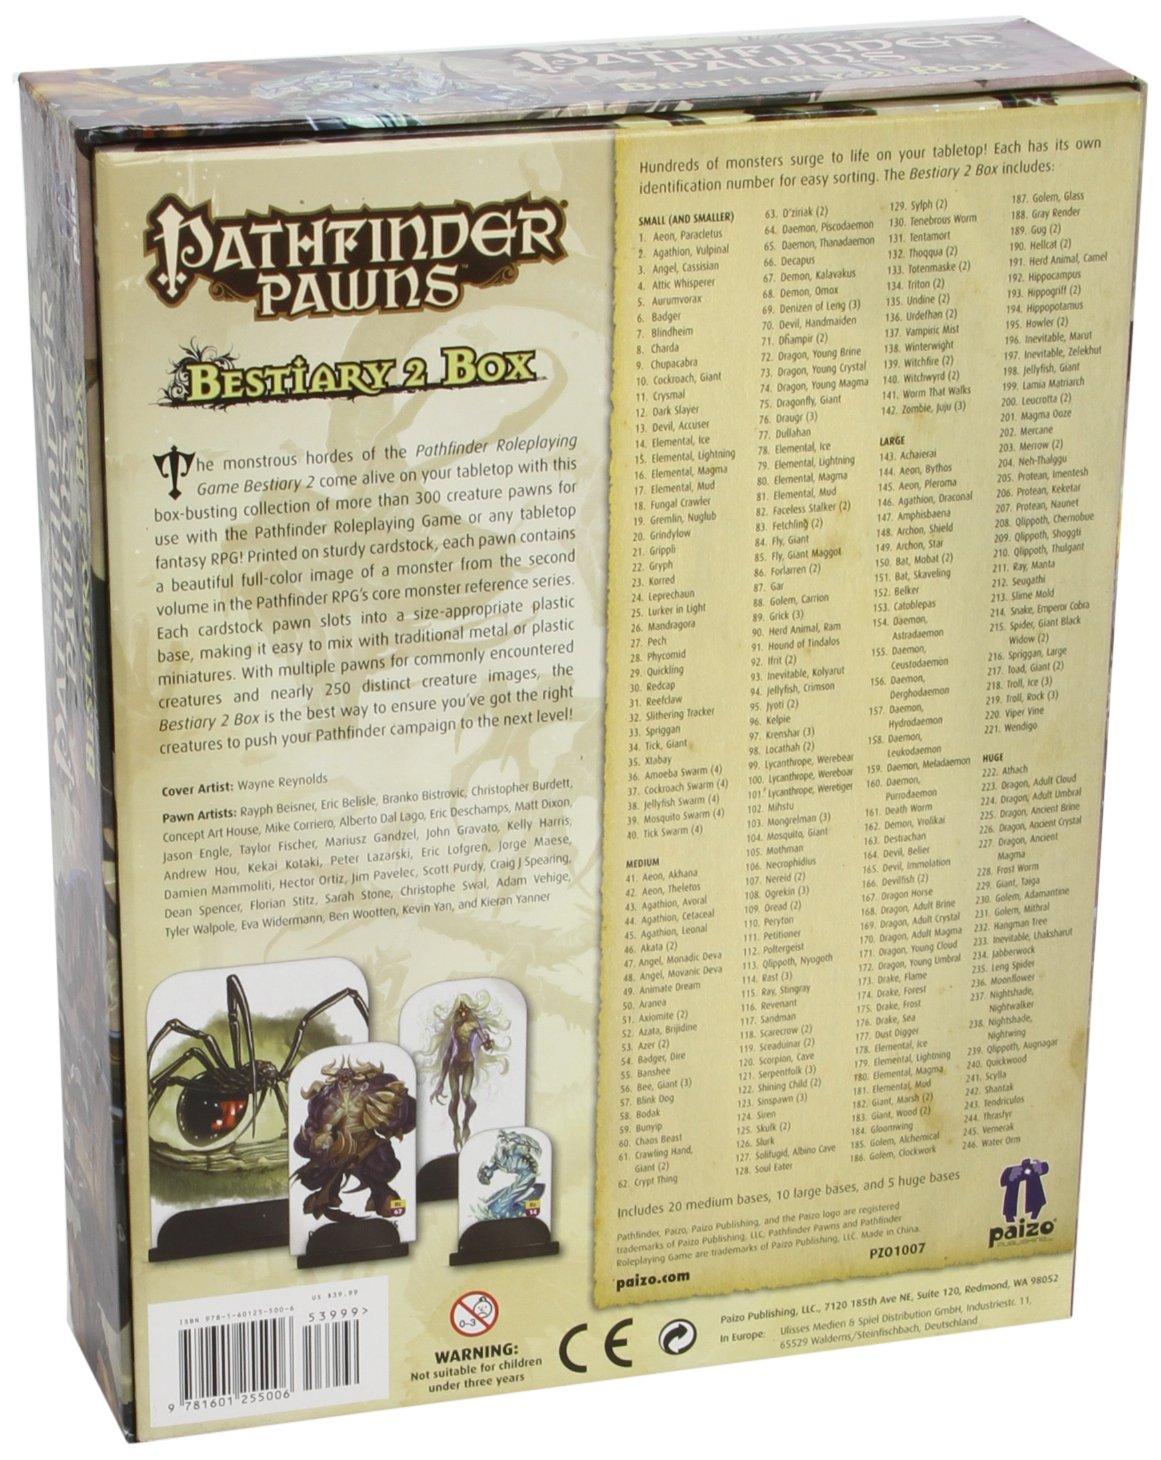 Pathfinder Pawns: Bestiary 2 Box by Paizo Inc. (Image #2)